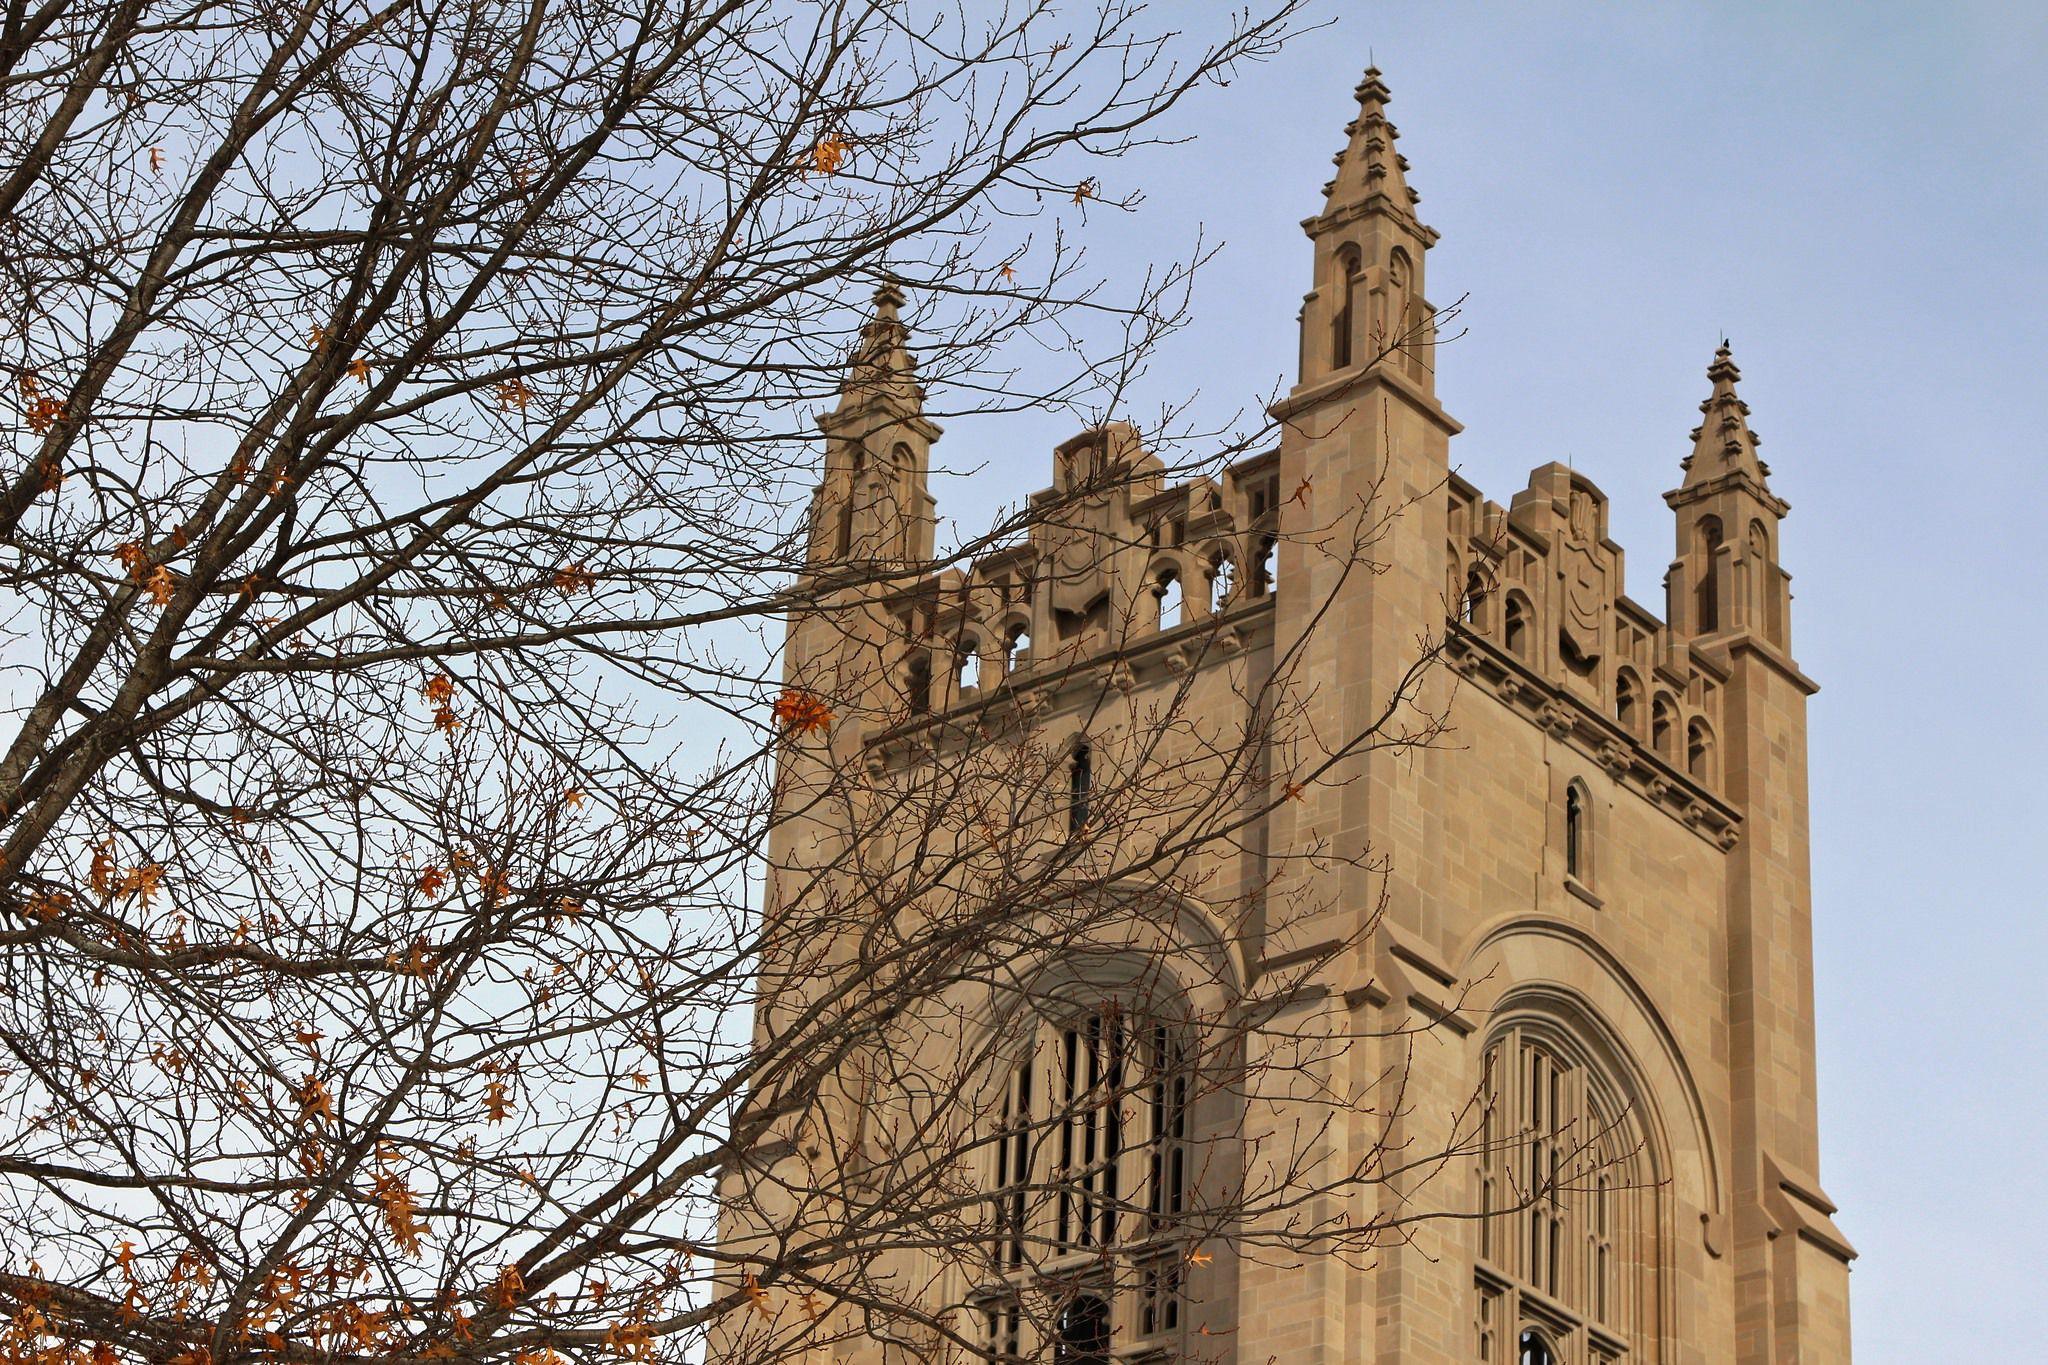 Carleton College Bell Tower